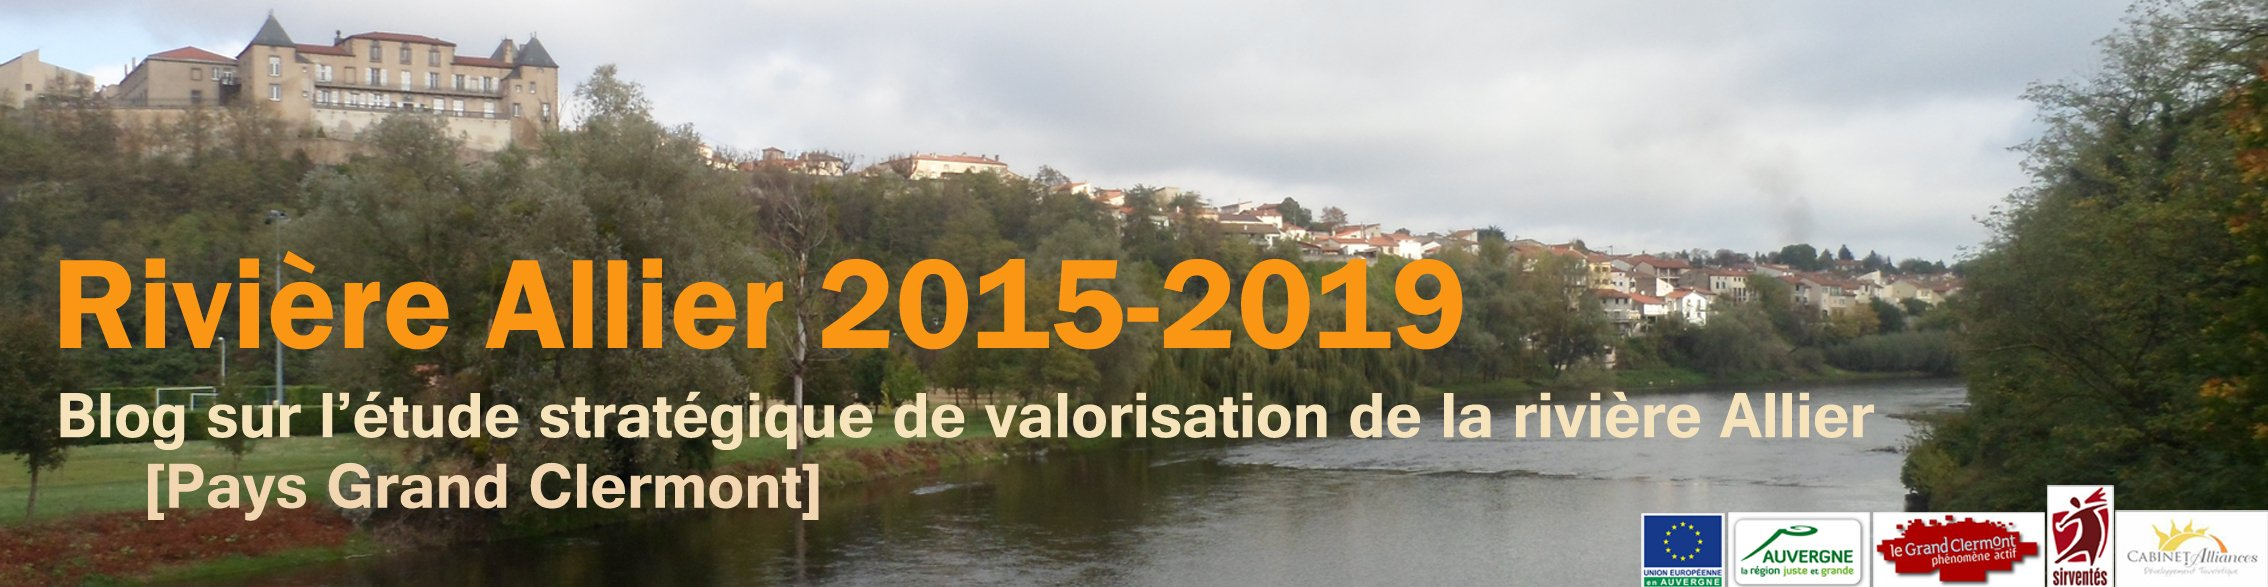 Riviere Allier Grand Clermont